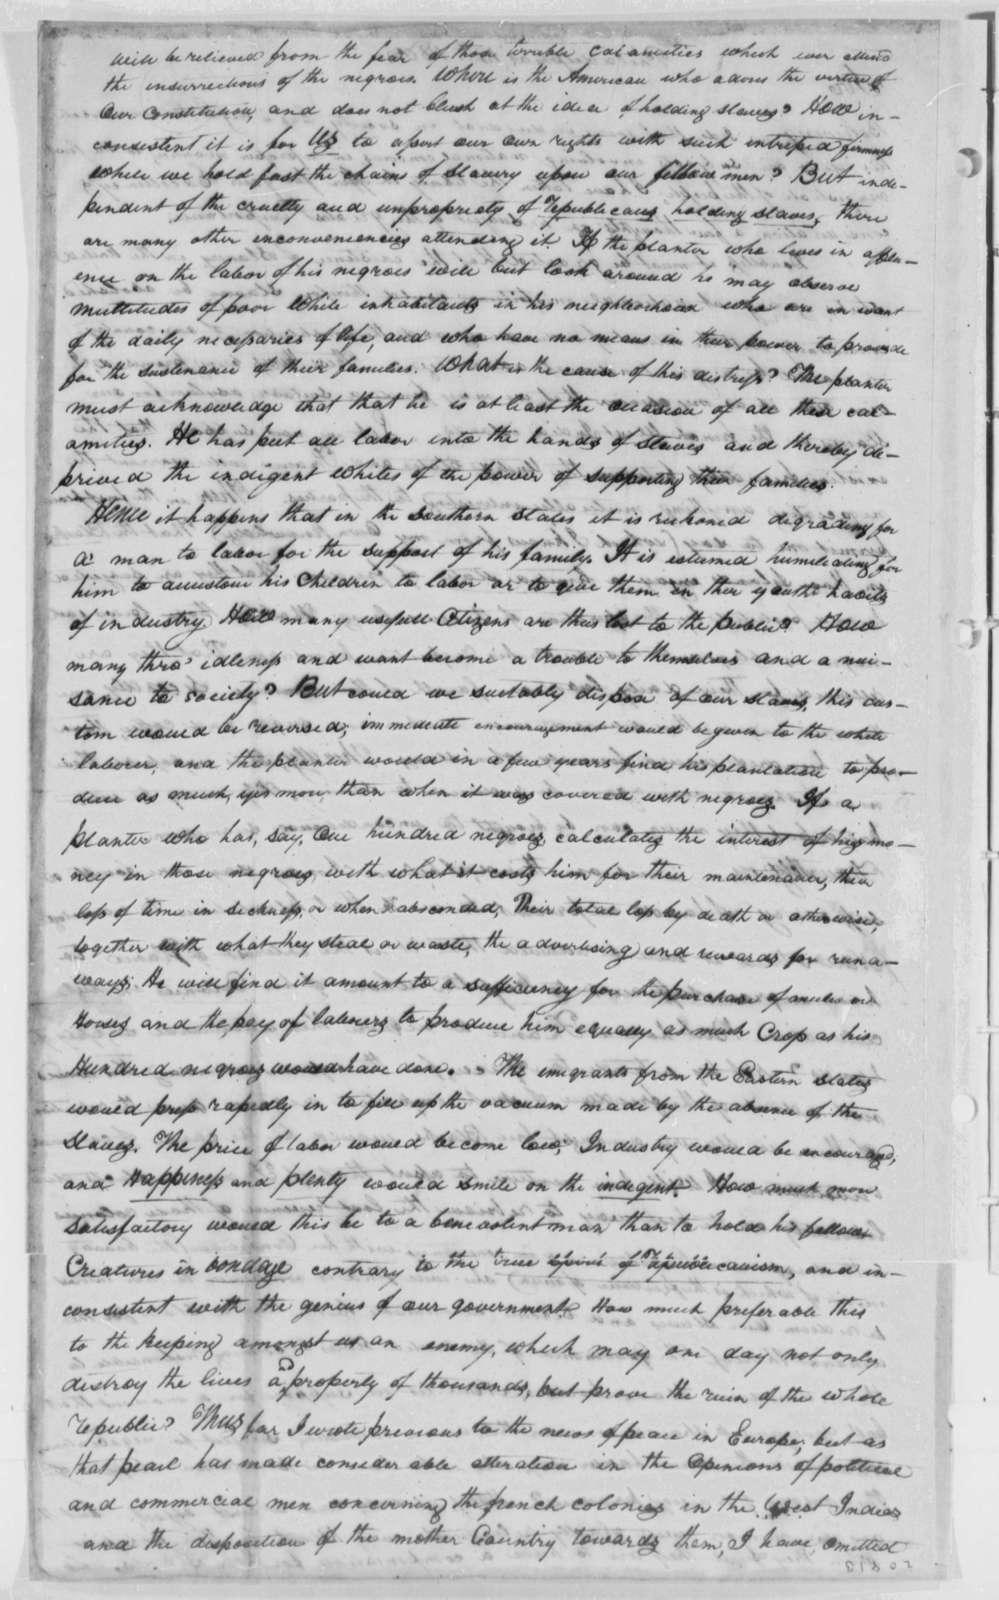 Davis Lummis to Thomas Jefferson, February 15, 1802